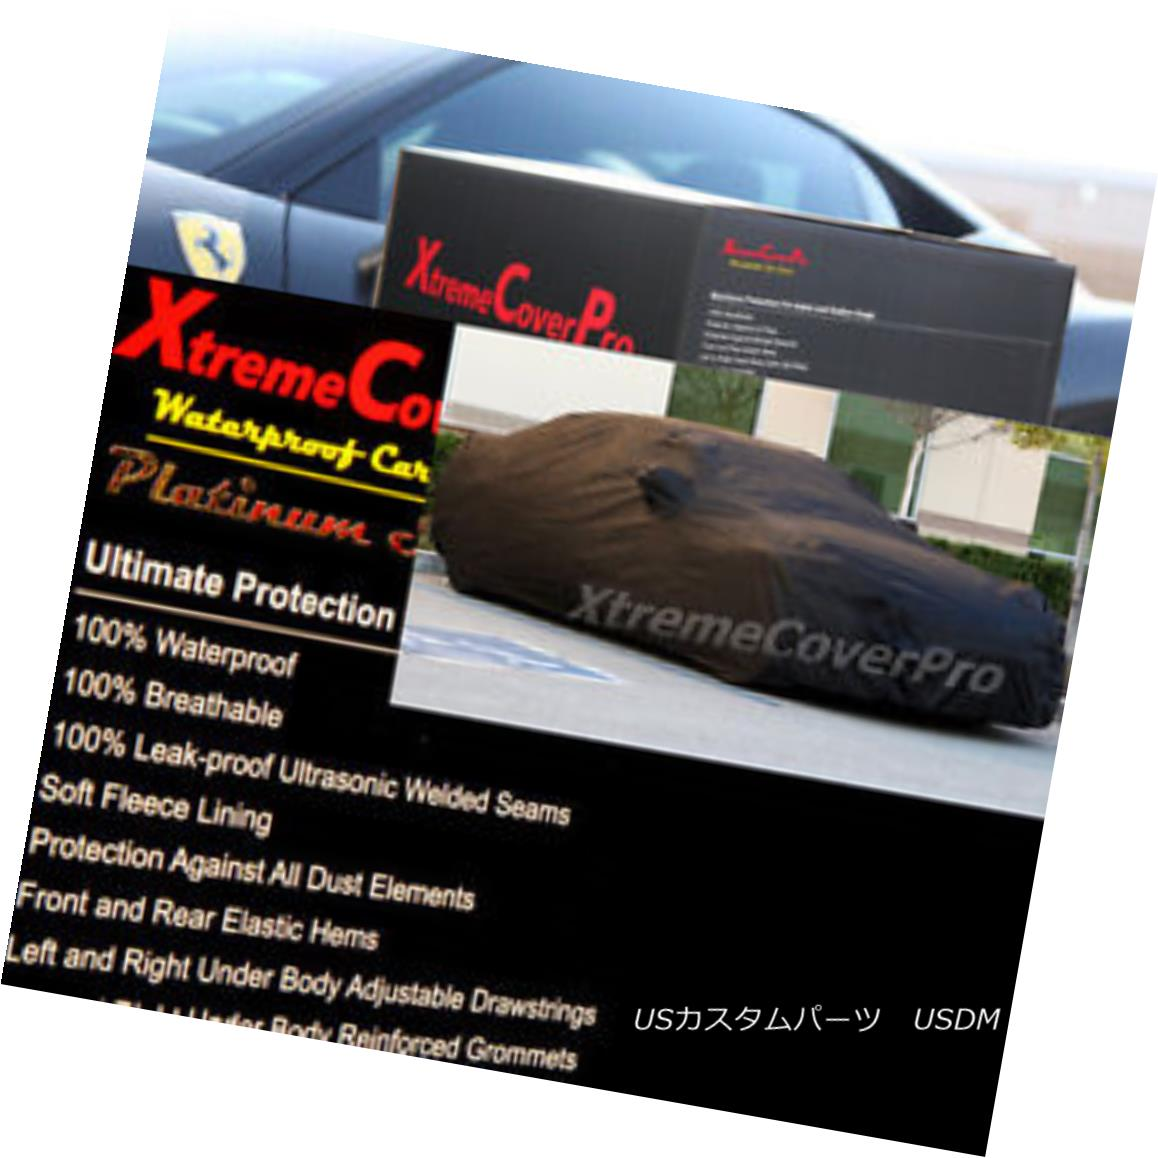 2012 2011 Cover 2010 Honda MirrorPocketを搭載した2010年2011年のホンダインサイト防水カーカバー Waterproof Insight Car w/MirrorPocket カーカバー